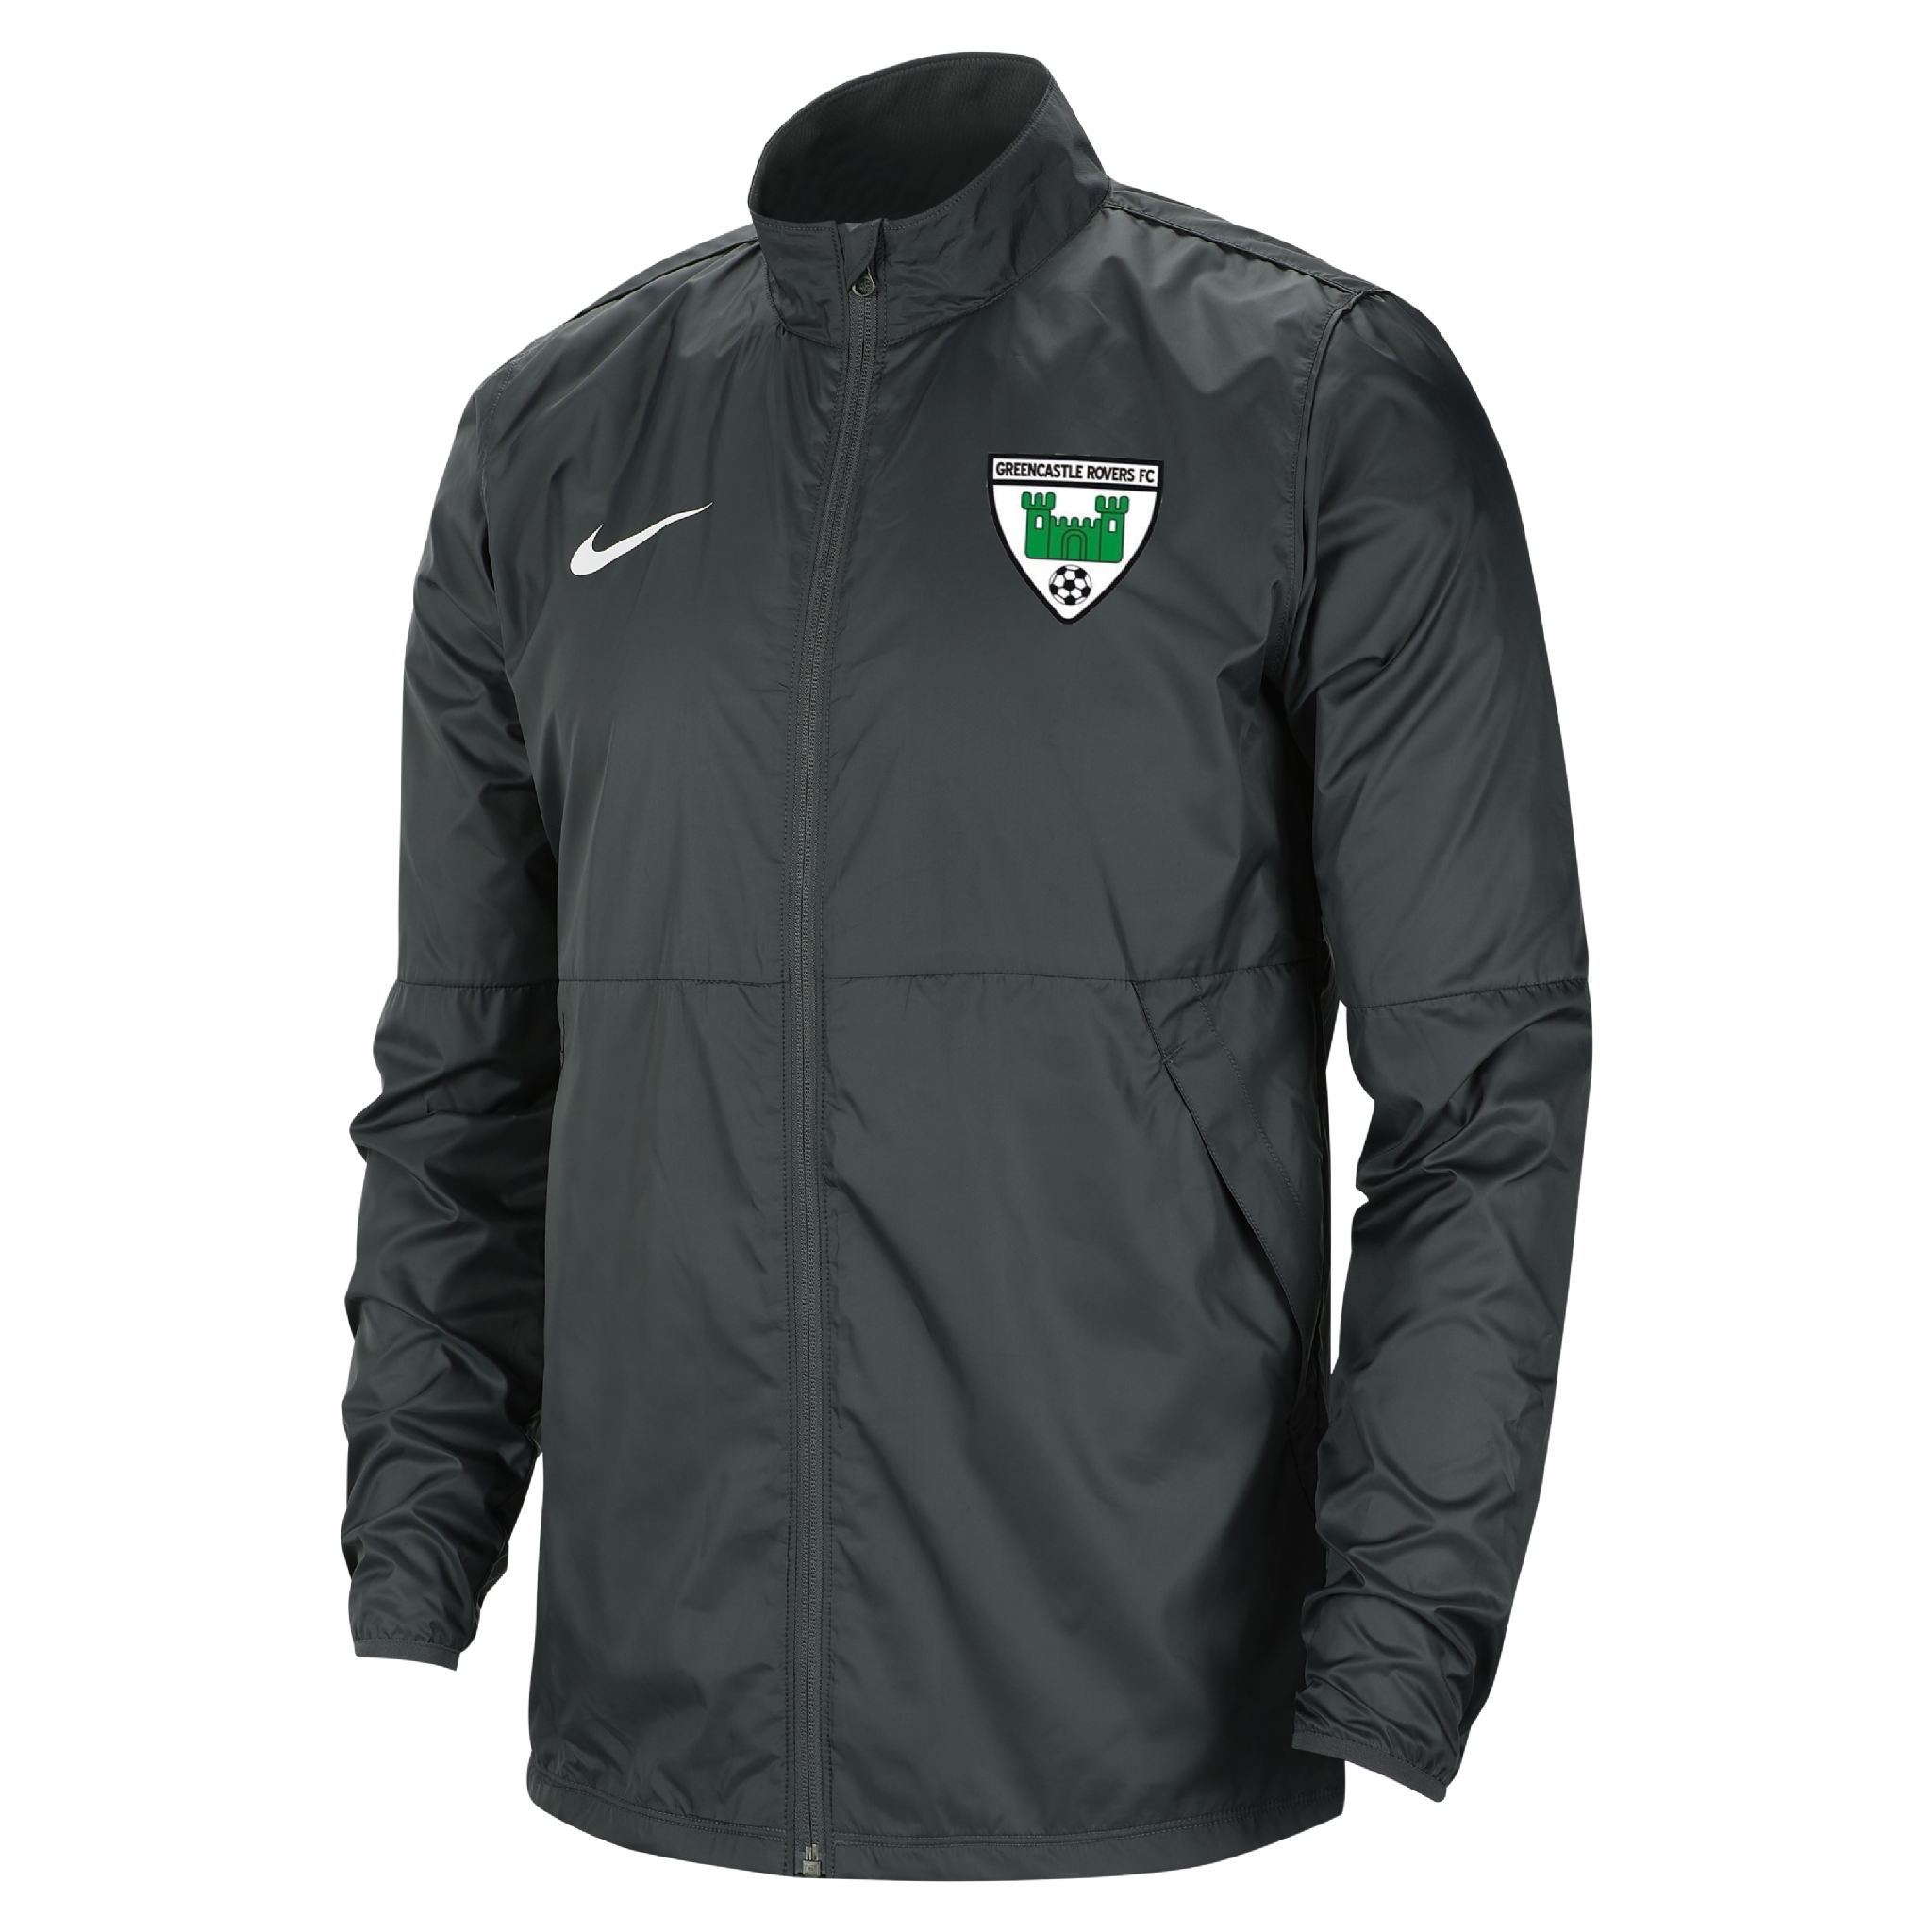 greencastle rovers park rain jacket 38811 p